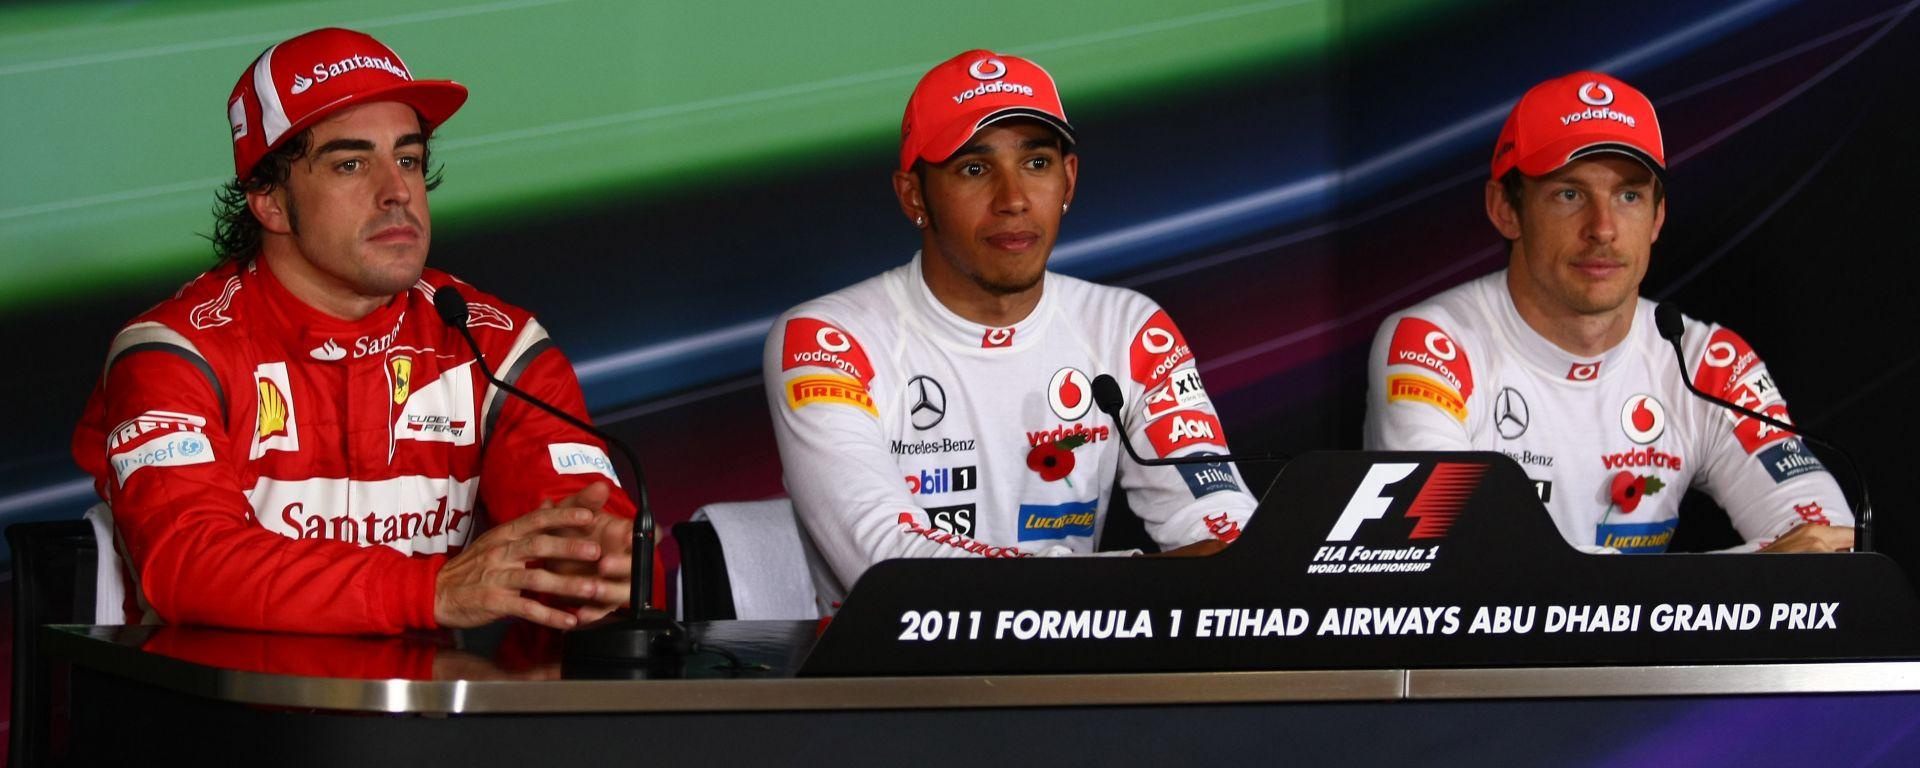 GP Abu Dhabi 2011, Yas Marina, Fernando Alonso (Ferrari), Lewis Hamilton e Jenson Button (McLaren)